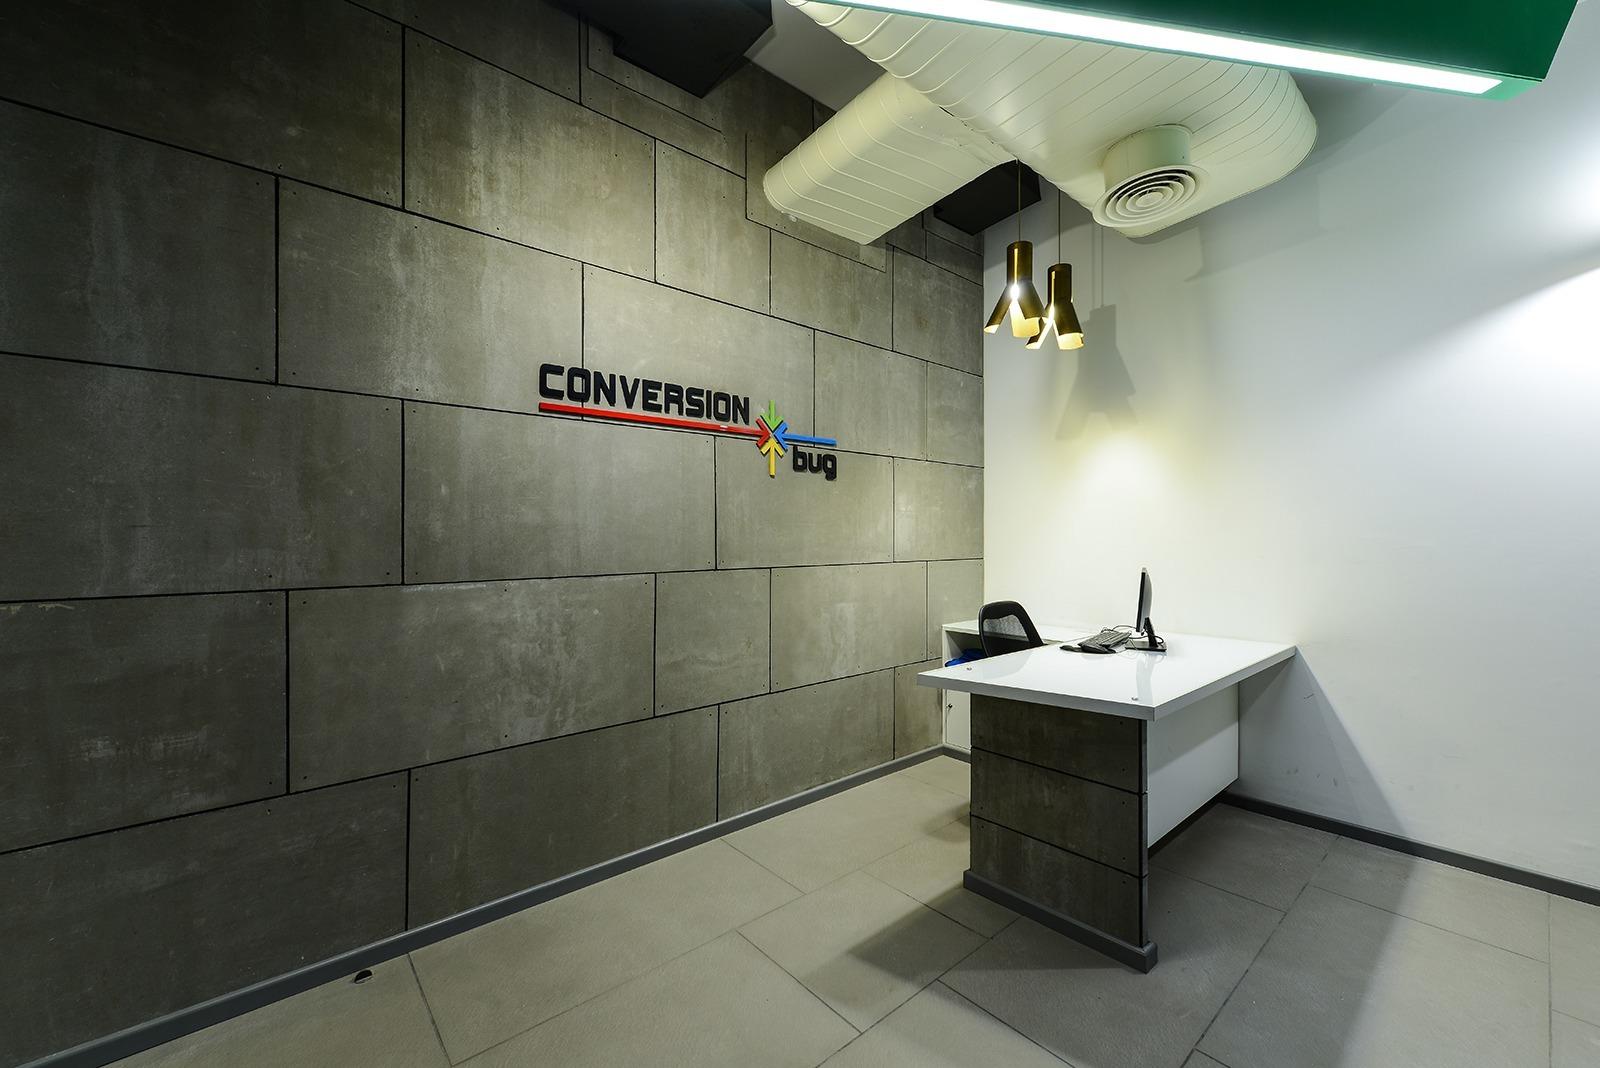 conversion-bug-office-14